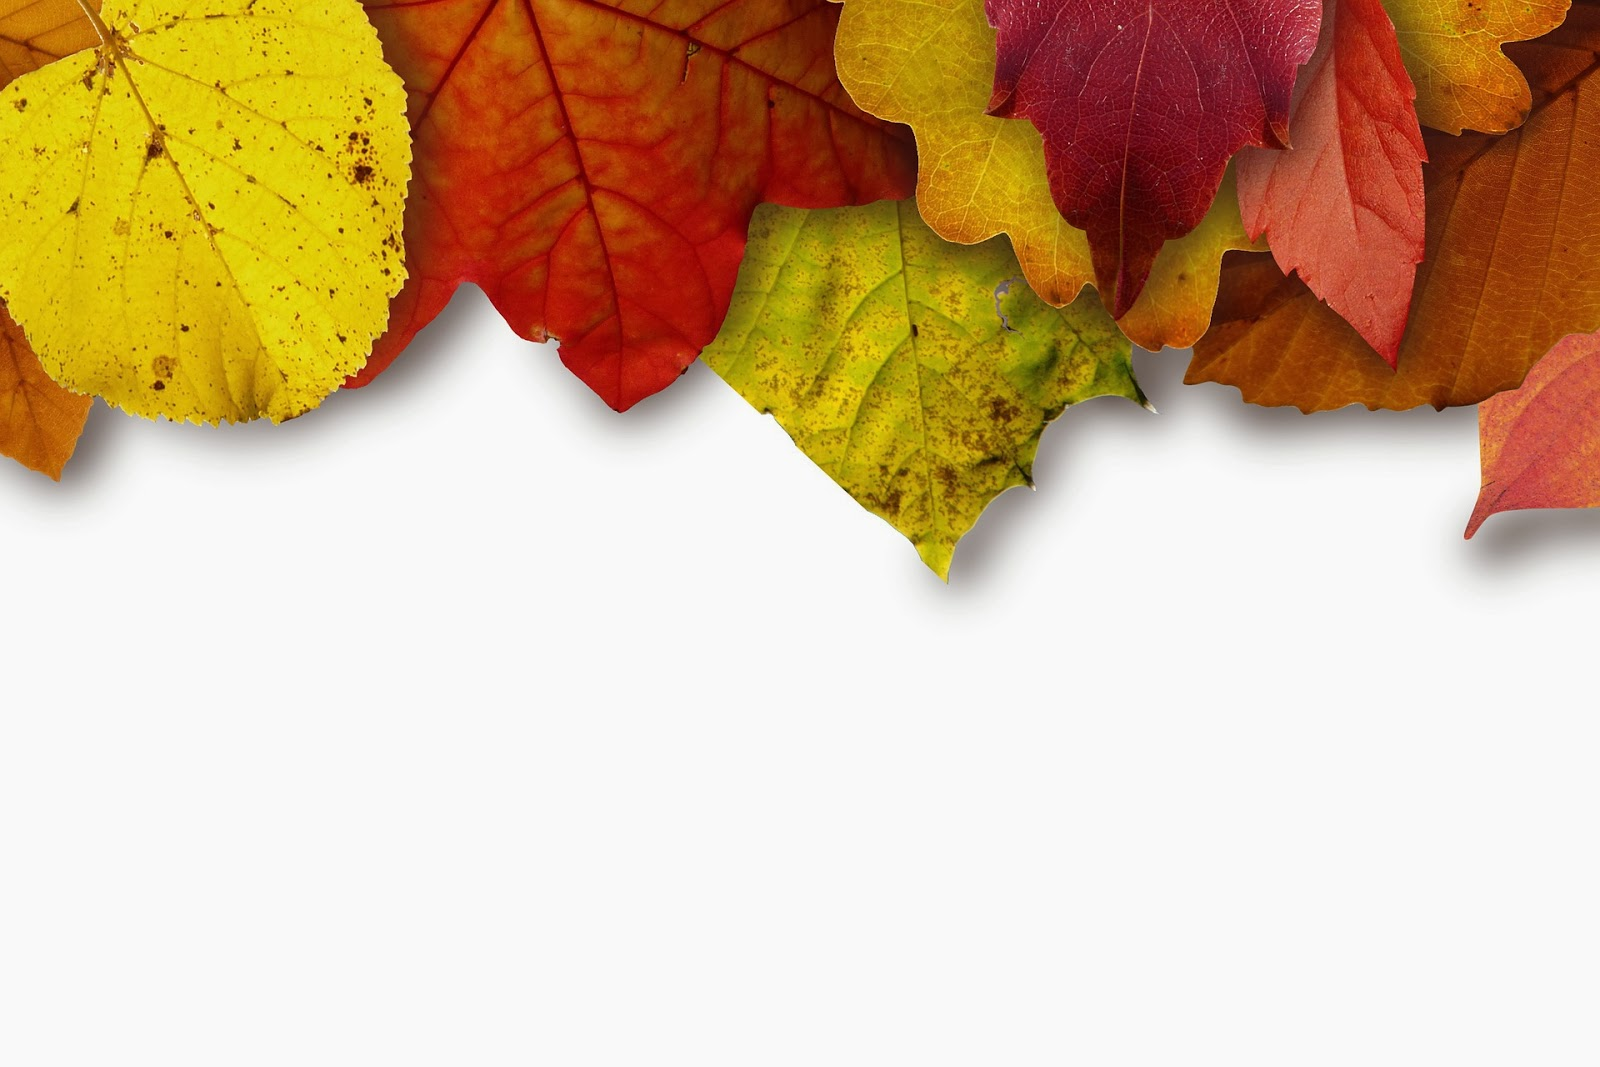 Heartbeat Magazine Finding Beautiful Free Fall Photos Online